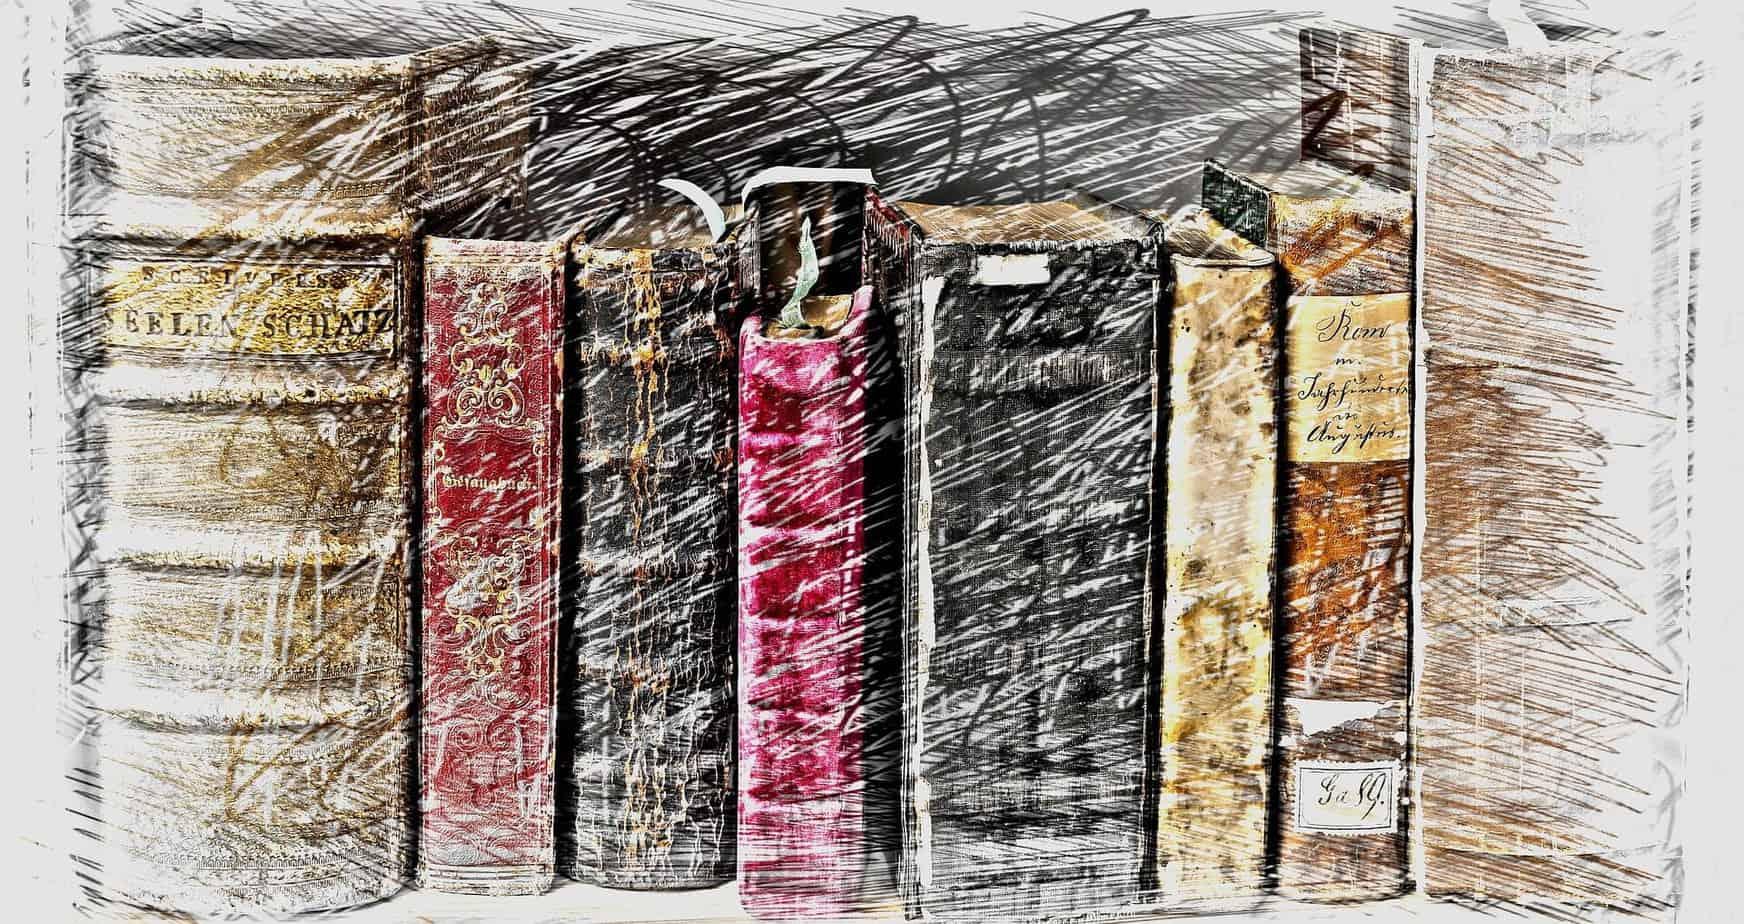 ATLIN COMMUNITY LIBRARY